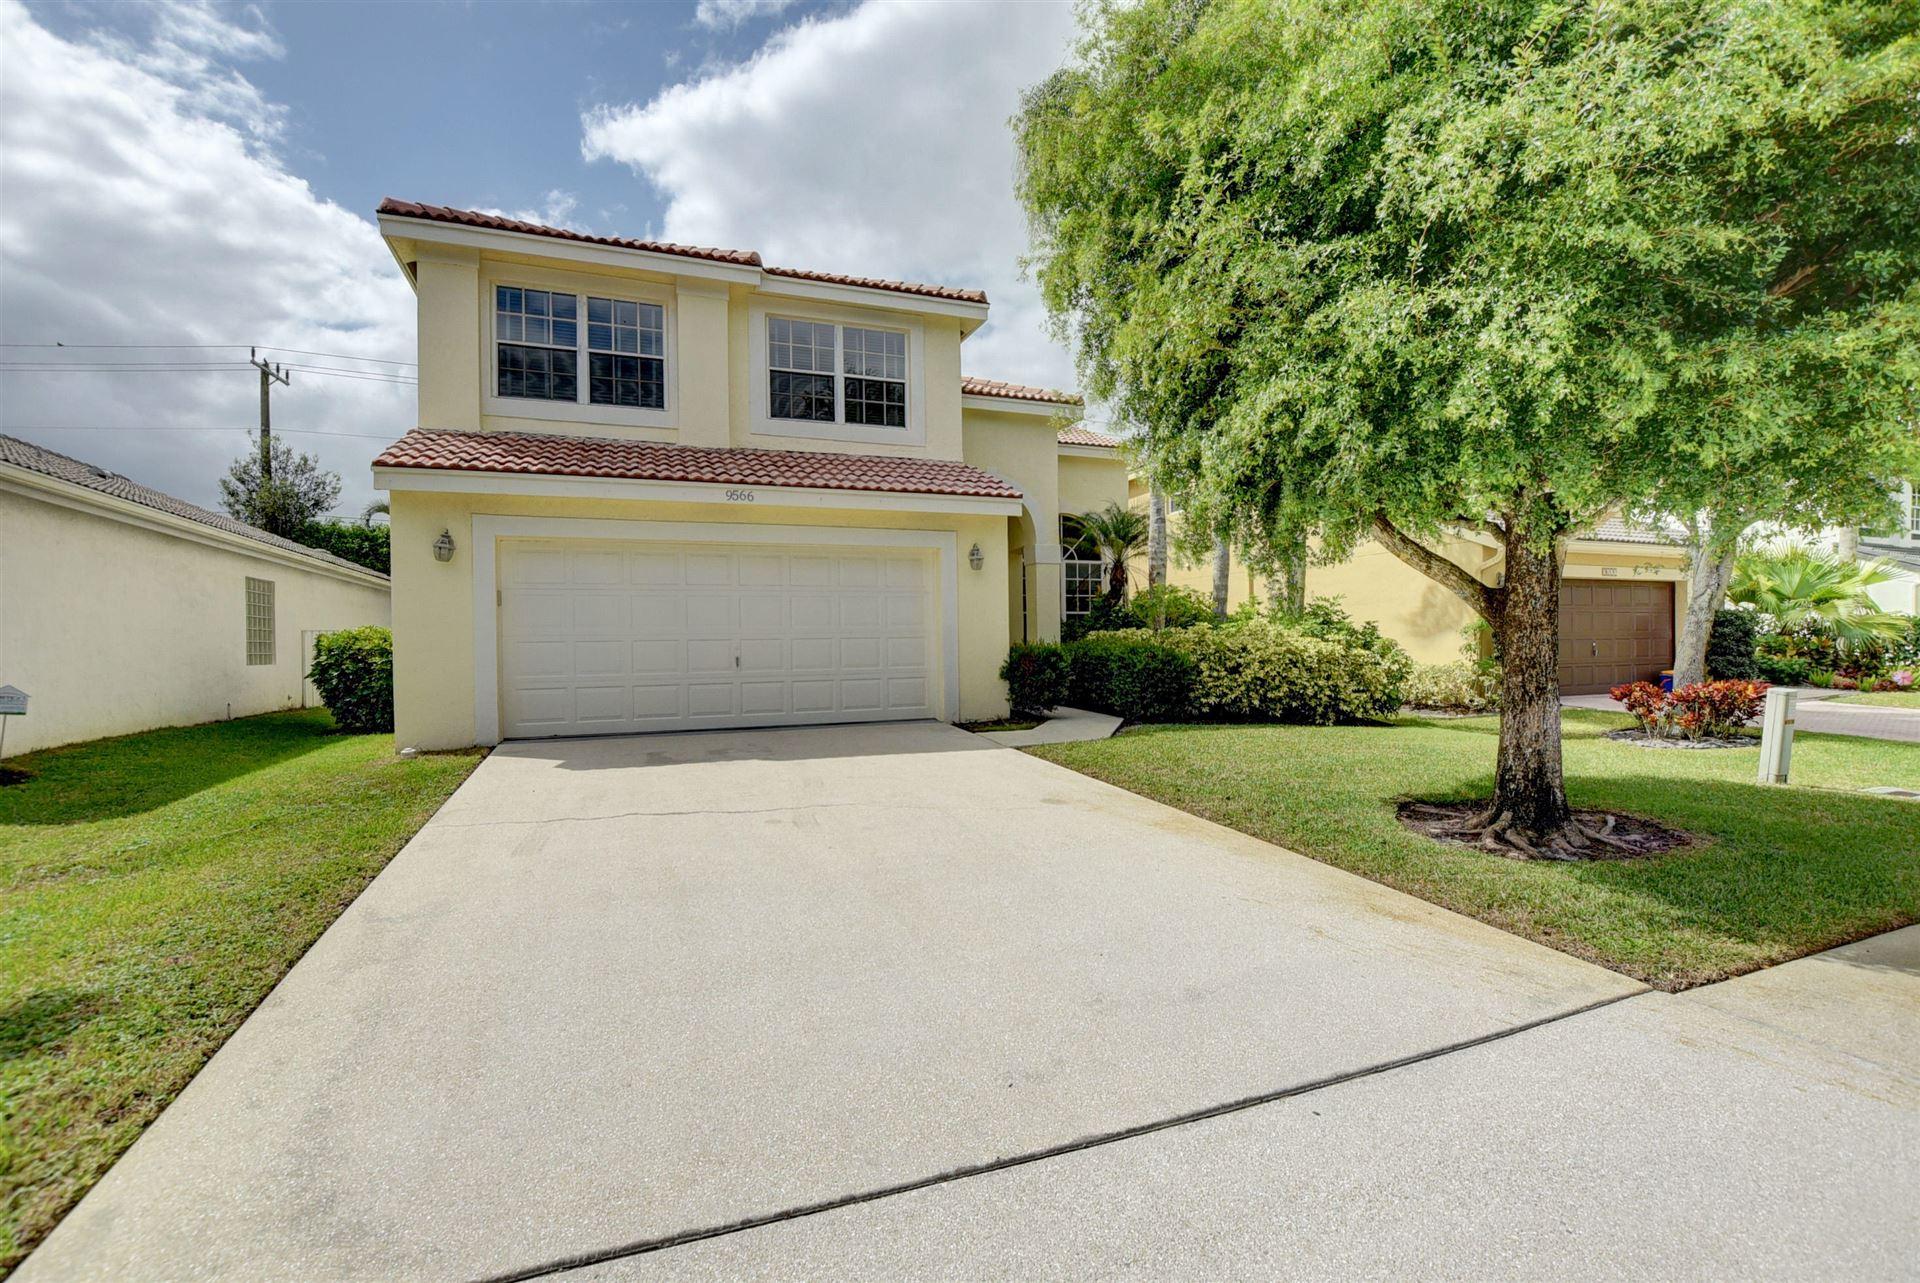 Photo of 9566 Fox Trot Lane, Boca Raton, FL 33496 (MLS # RX-10657924)